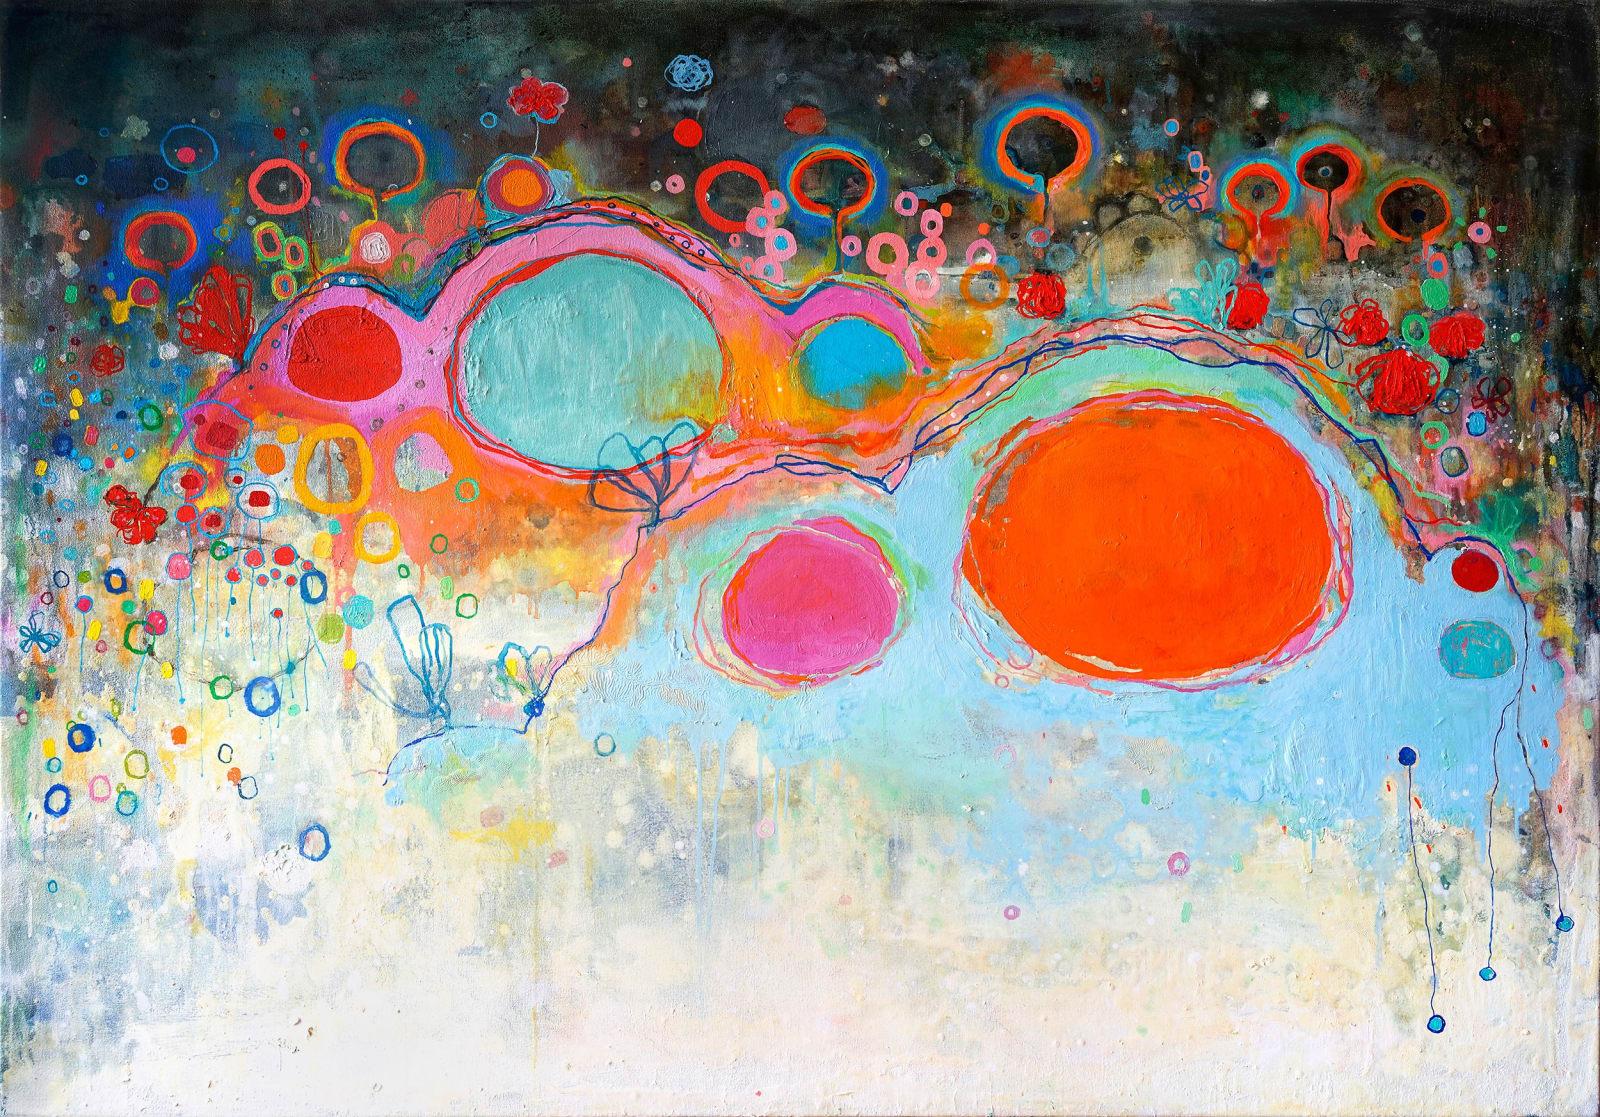 Clara Fialho. Dreams of Falling, 2020. Oil on Canvas. 48 × 60 in.